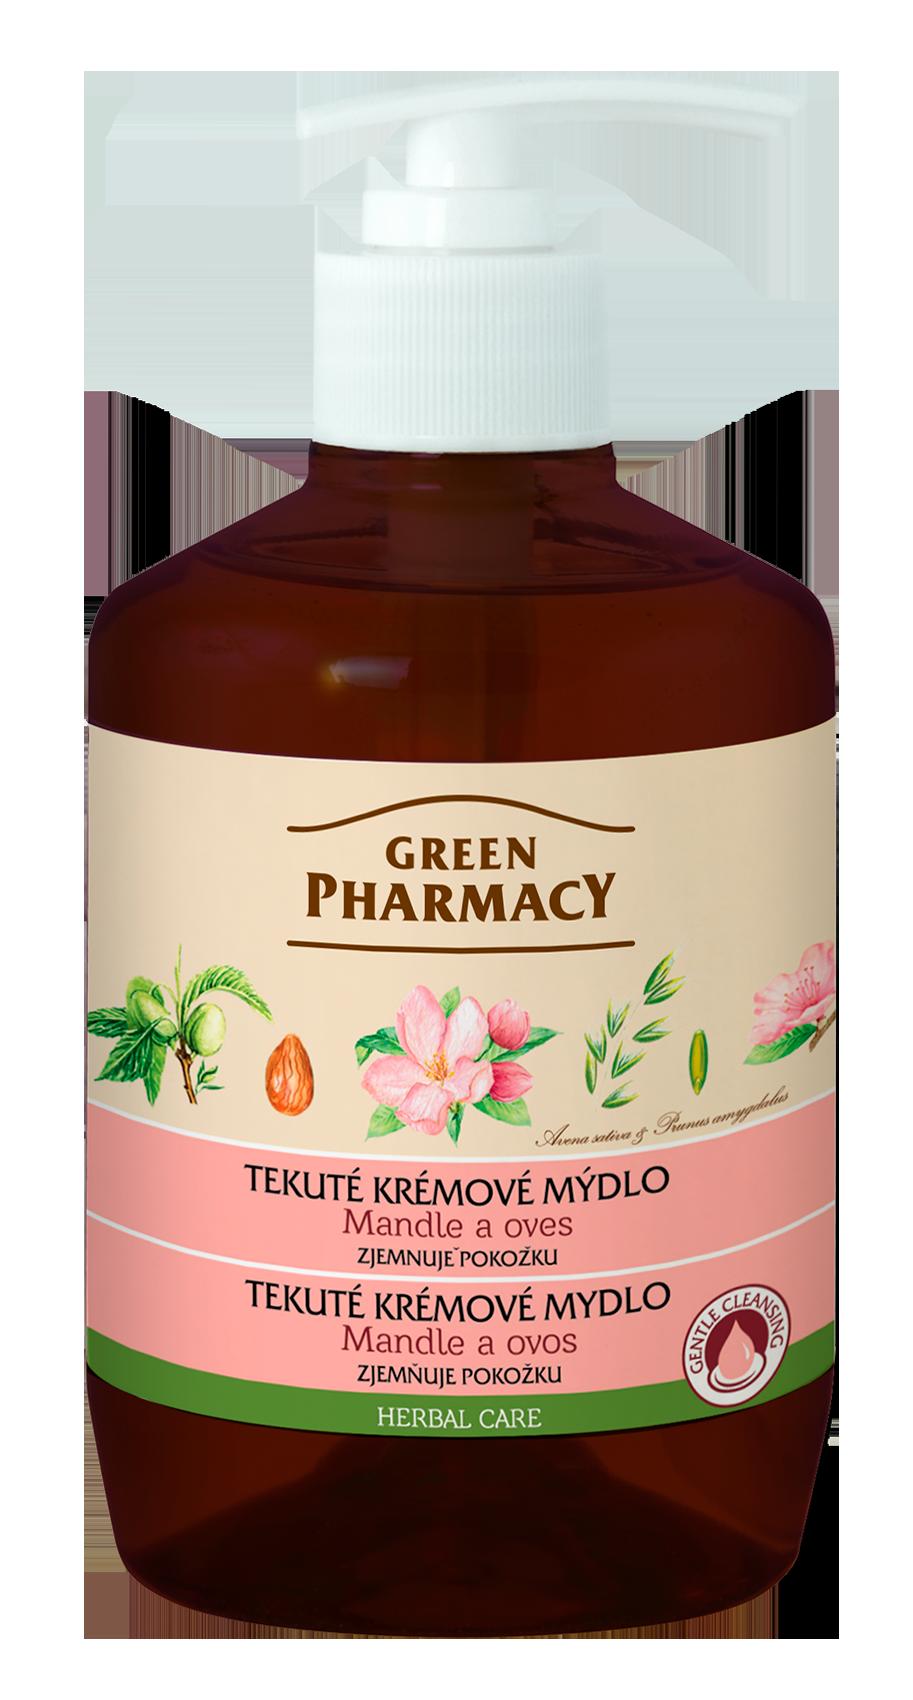 Green Pharmacy Mandle a Ovos - tekuté krémové mydlo zjemňujúce pokožku, 460 ml